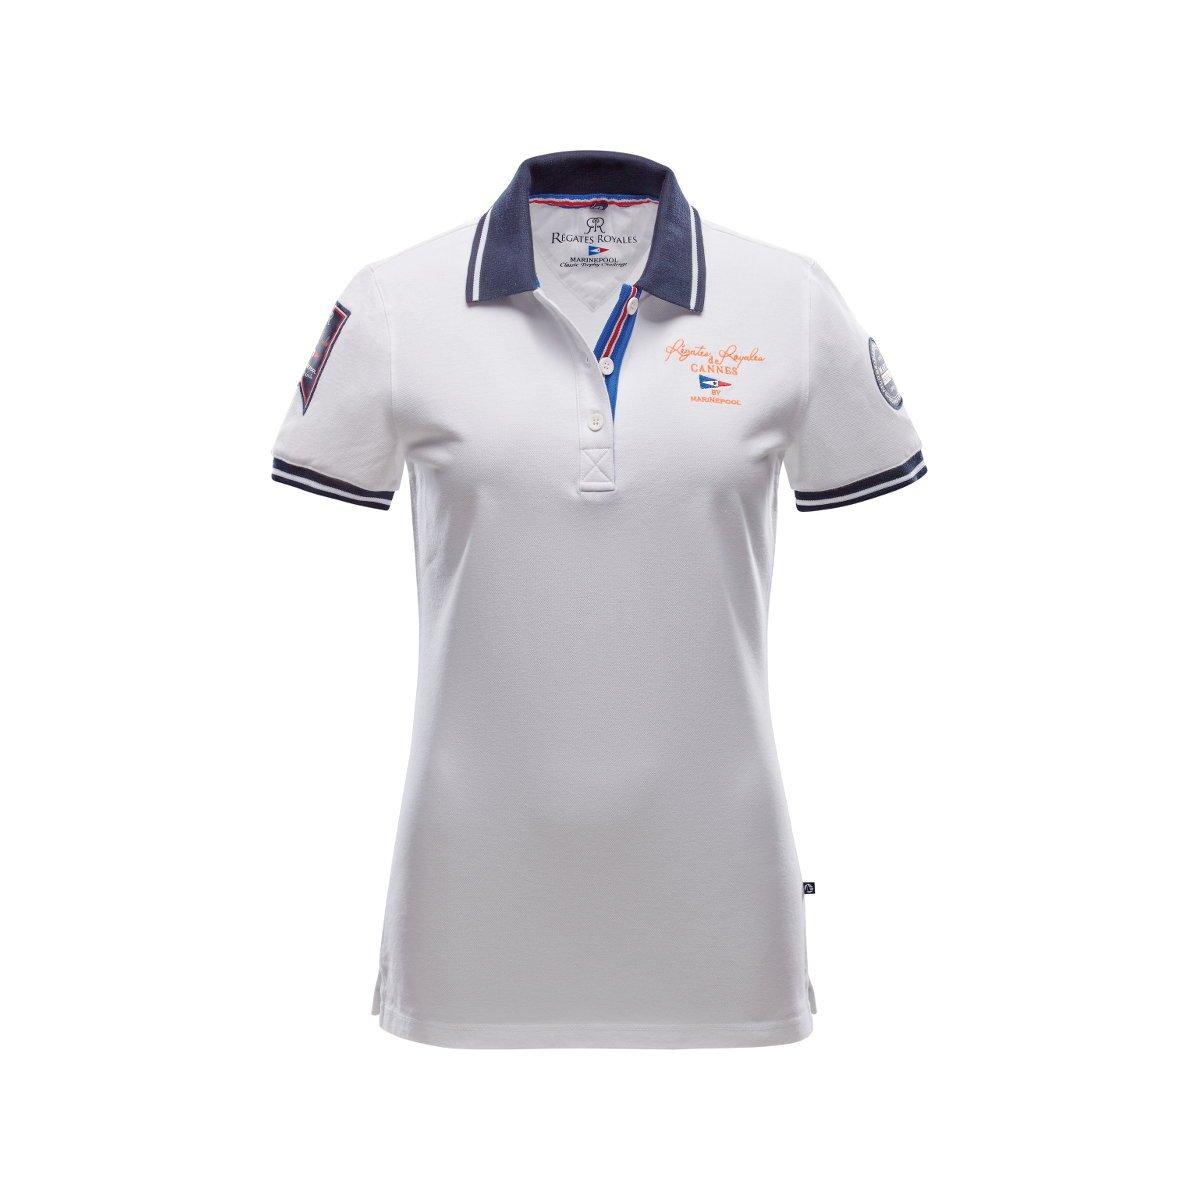 Marinepool RR Yacht Poloshirt Damen     weiß B01DDQ701E T-Shirts Charakteristisch 7299b3